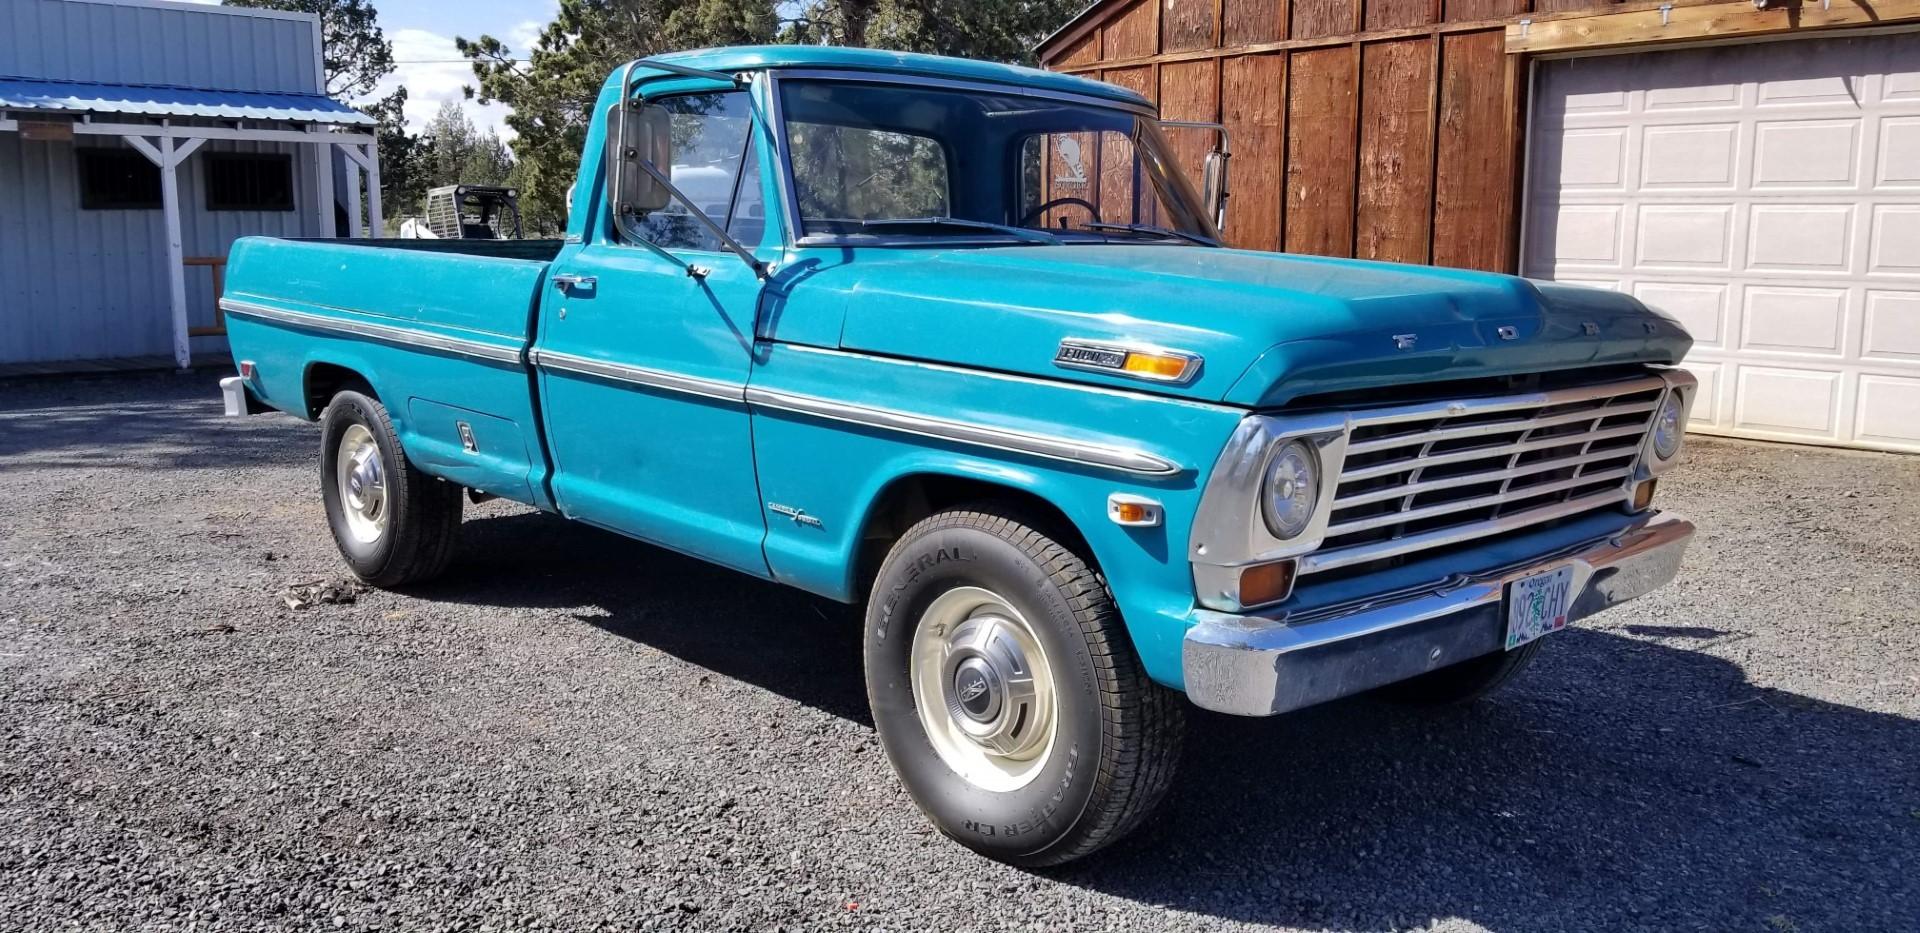 1969-Ford-F250-Custom-Cab-Camper-Special-360ci-V8-23